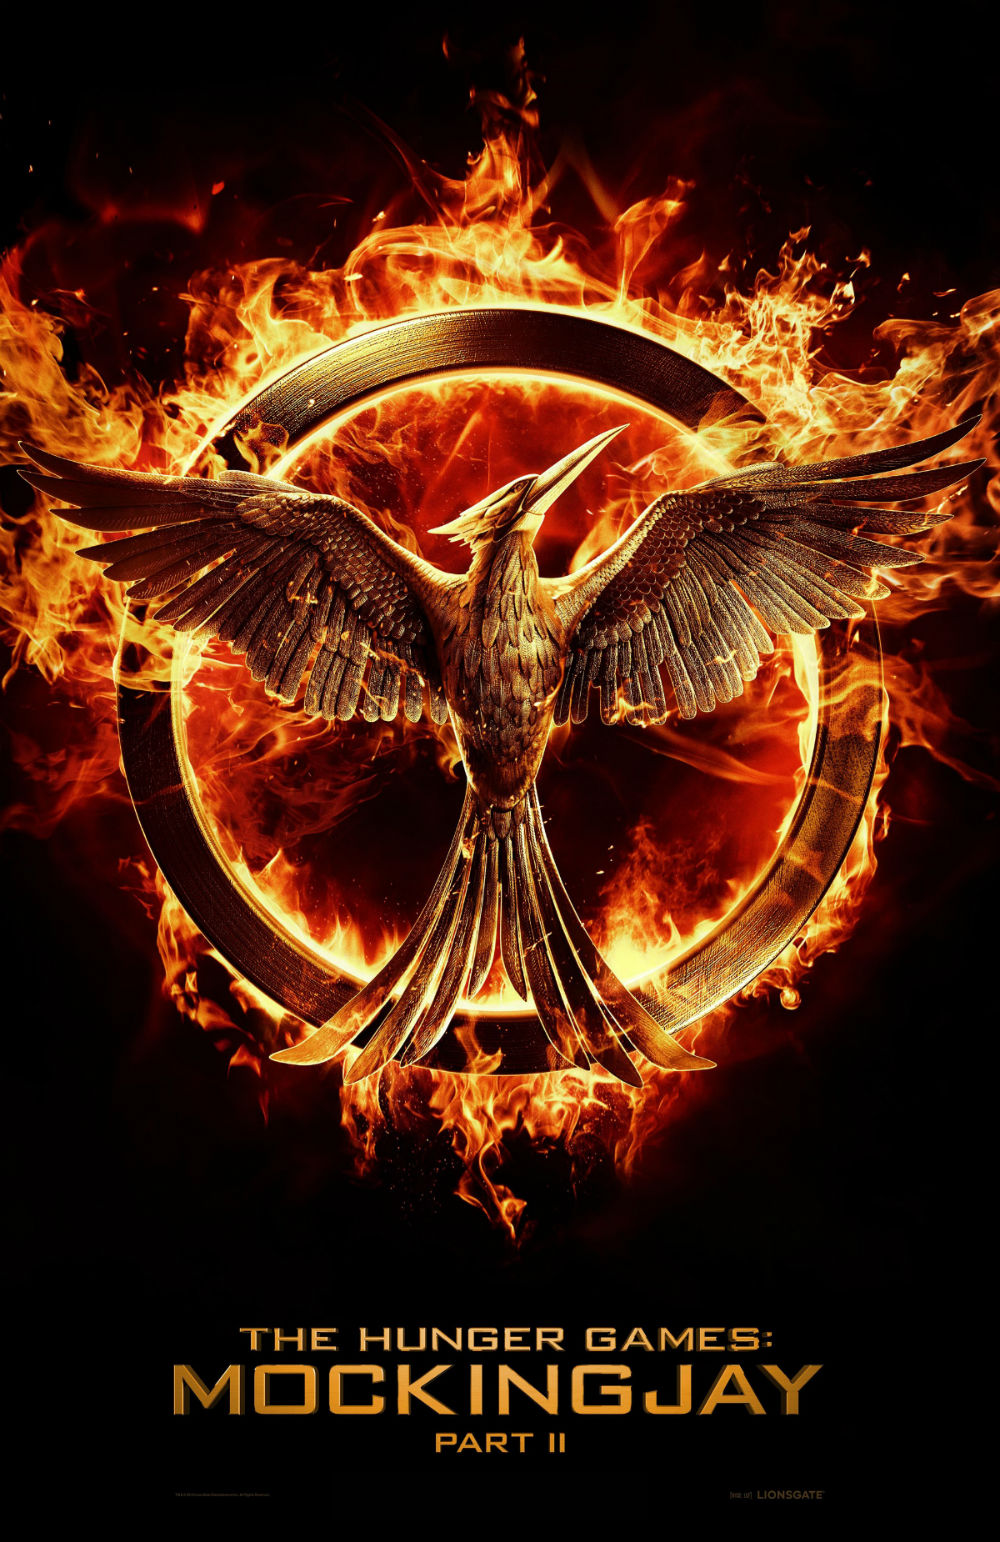 Hunger-Games-Mockingjay-Part-2-big